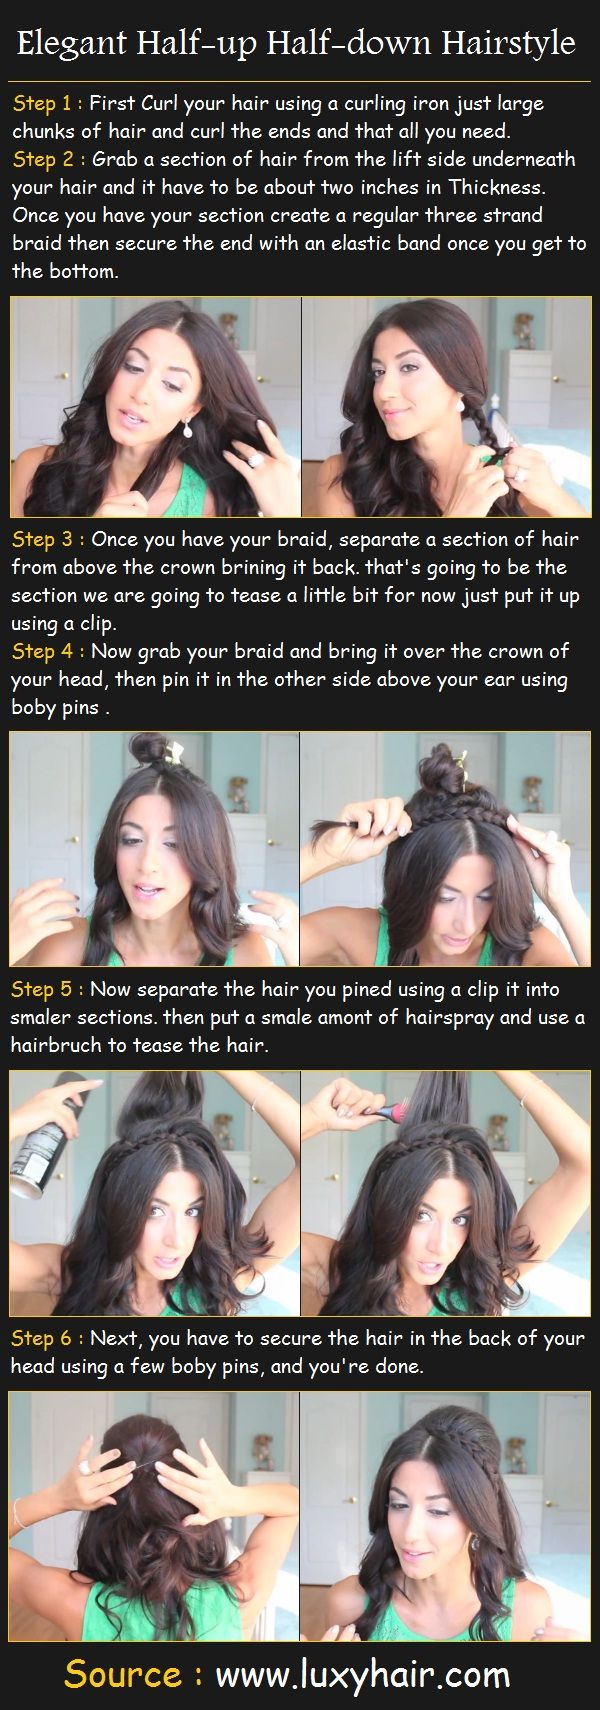 Elegant Half-up Half-down Hairstyle: Hair Ideas, Half Down Hairstyles, Updo Braids Hairstyles, Hairstyles Tutorials, Elegant Half Up, Hair Style, Hairstyles Ideas, Half Up Hairstyles, Elegant Hairstyles